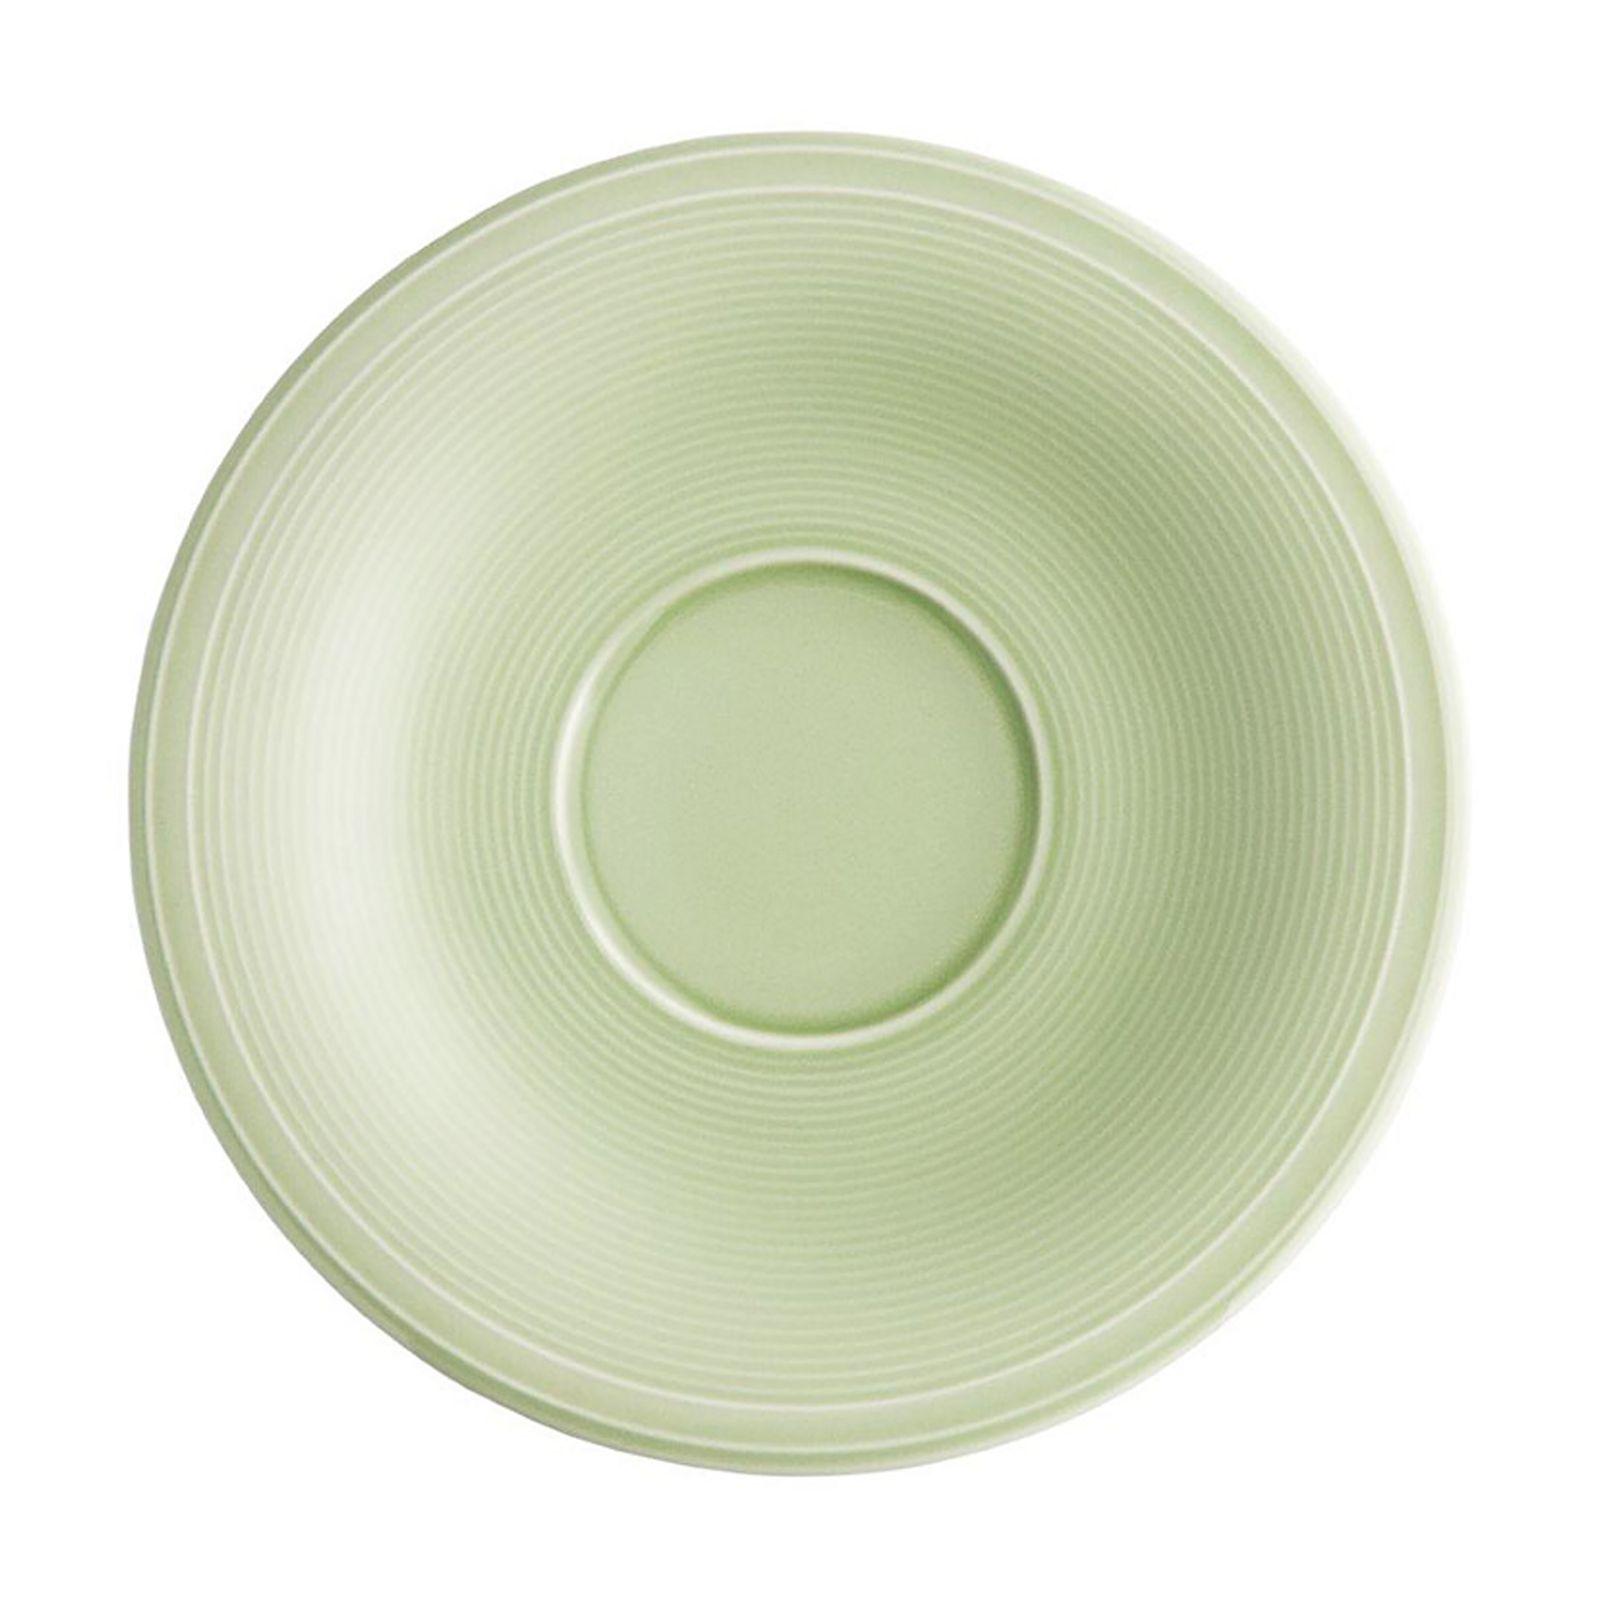 Sous-tasse Sweet vert 15,5 cm AMBITION